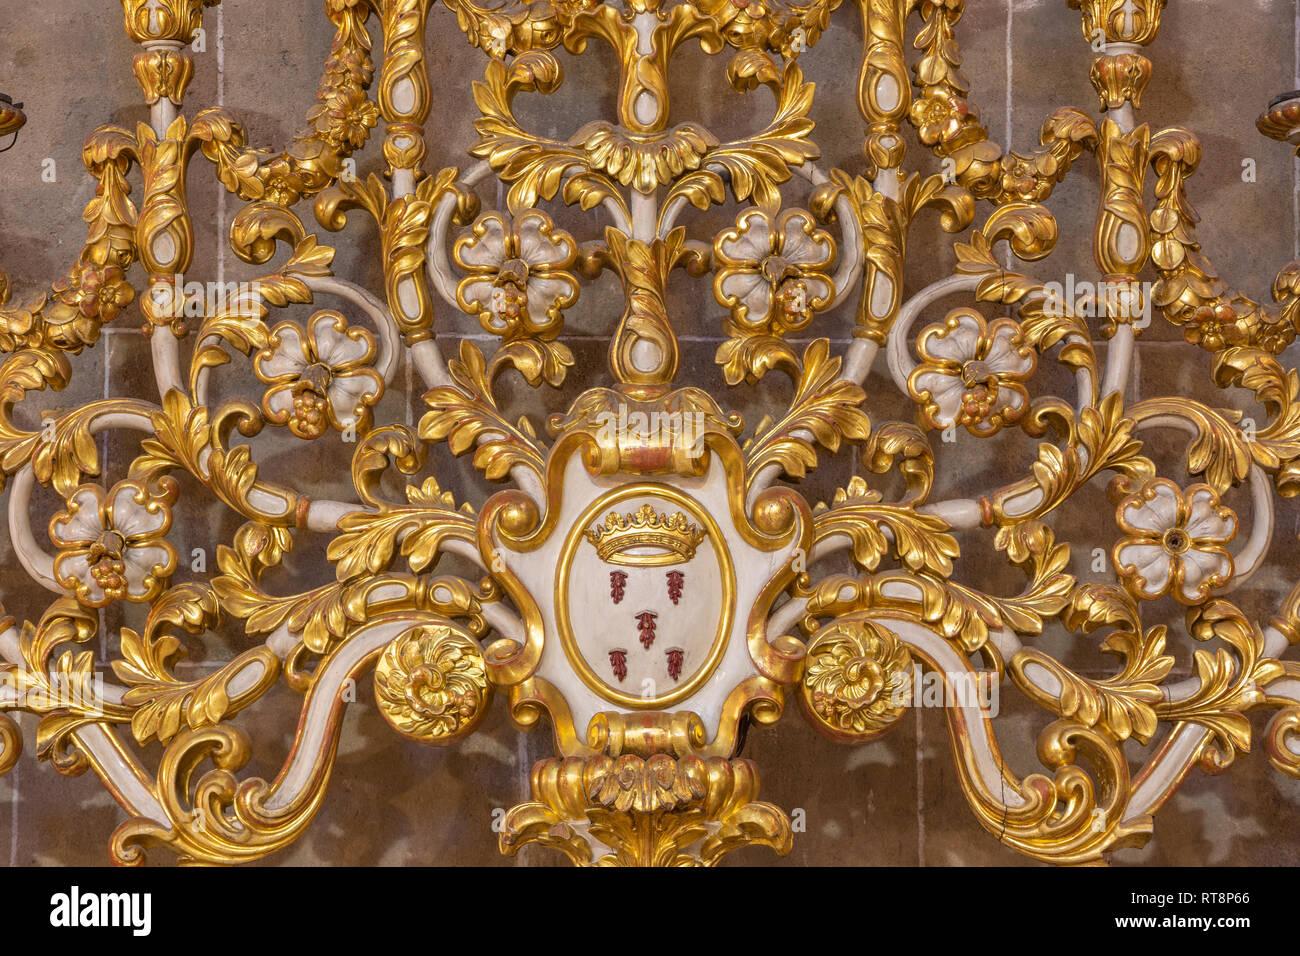 PALMA DE MALLORCA, SPAIN - JANUARY 29, 2019: The detail of baroque candlestick in the church Esglesia de la Inmaculada Concepcion. - Stock Image